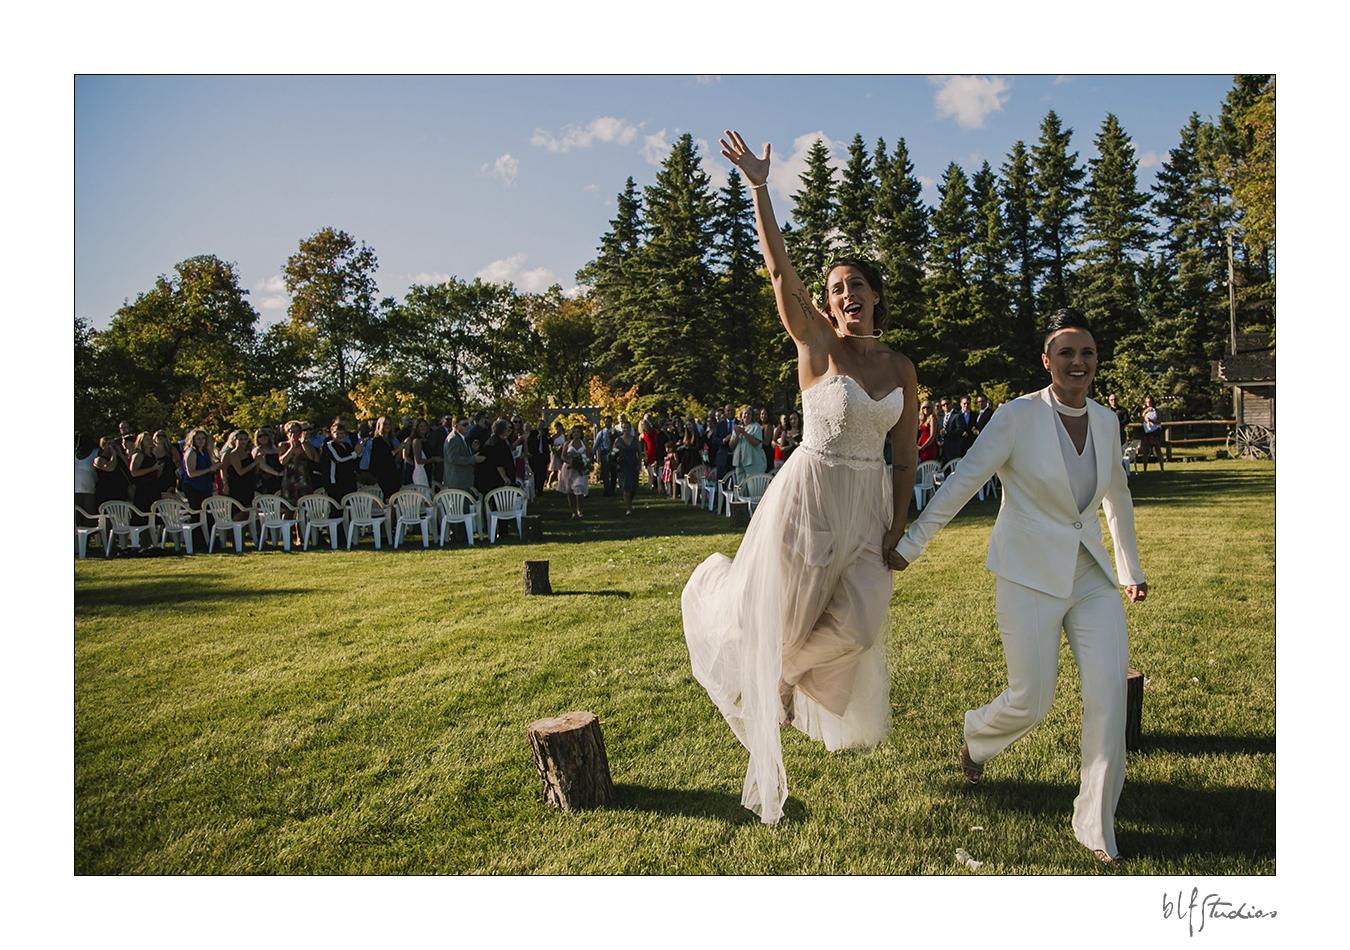 032-winnipeg-hitchnpost-wedding-marla-alana.jpg